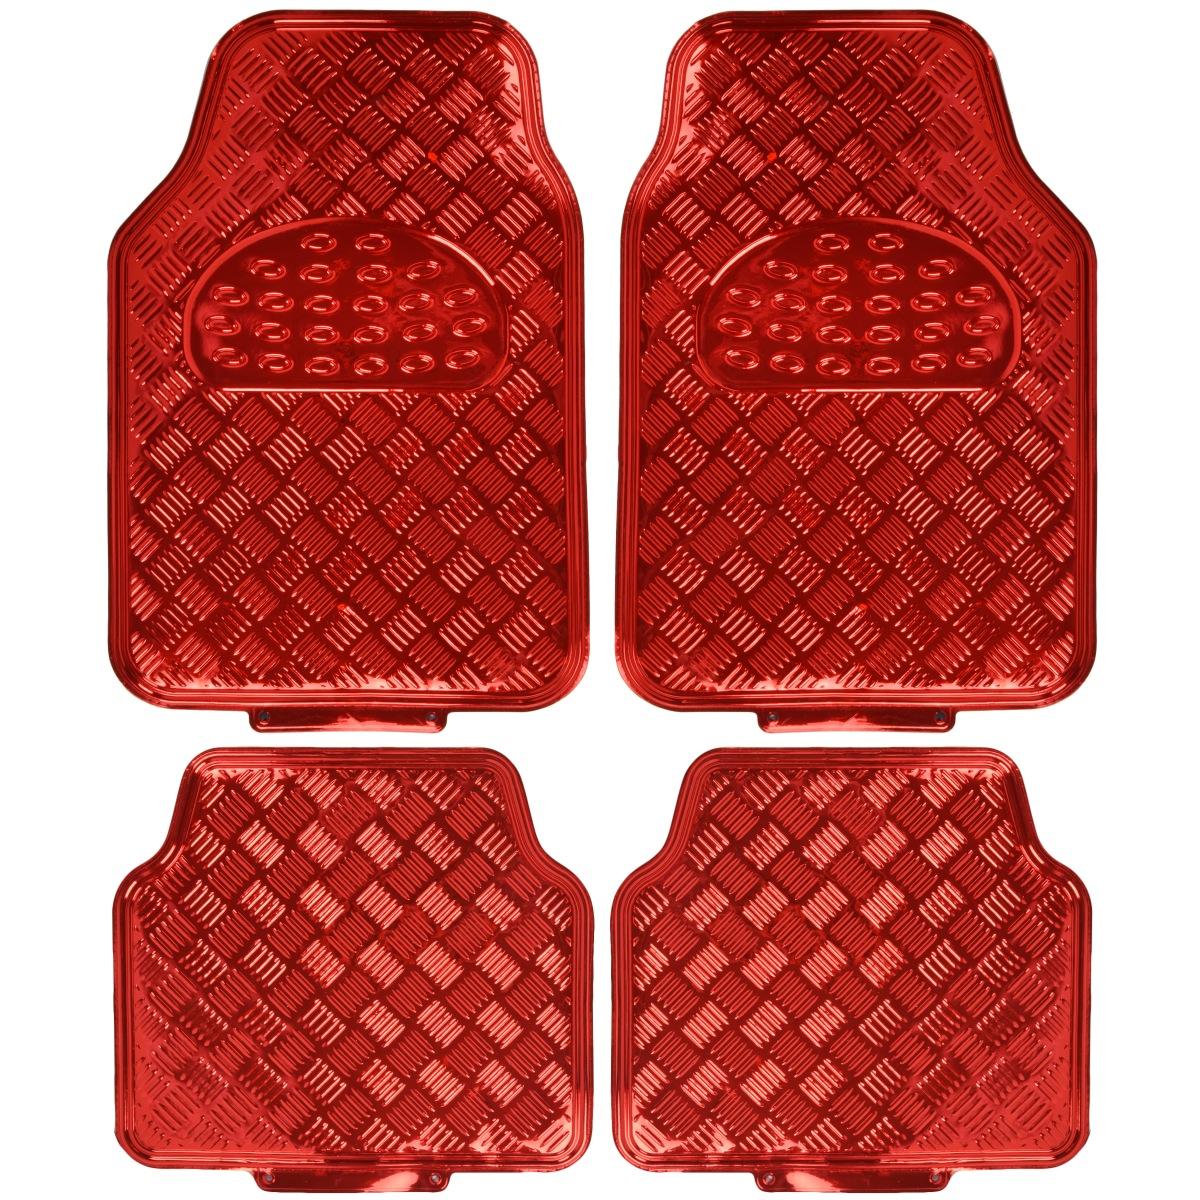 red main itm floors rd floor metallic mt duty guard piece ebay auto rubber mats sheen heavy